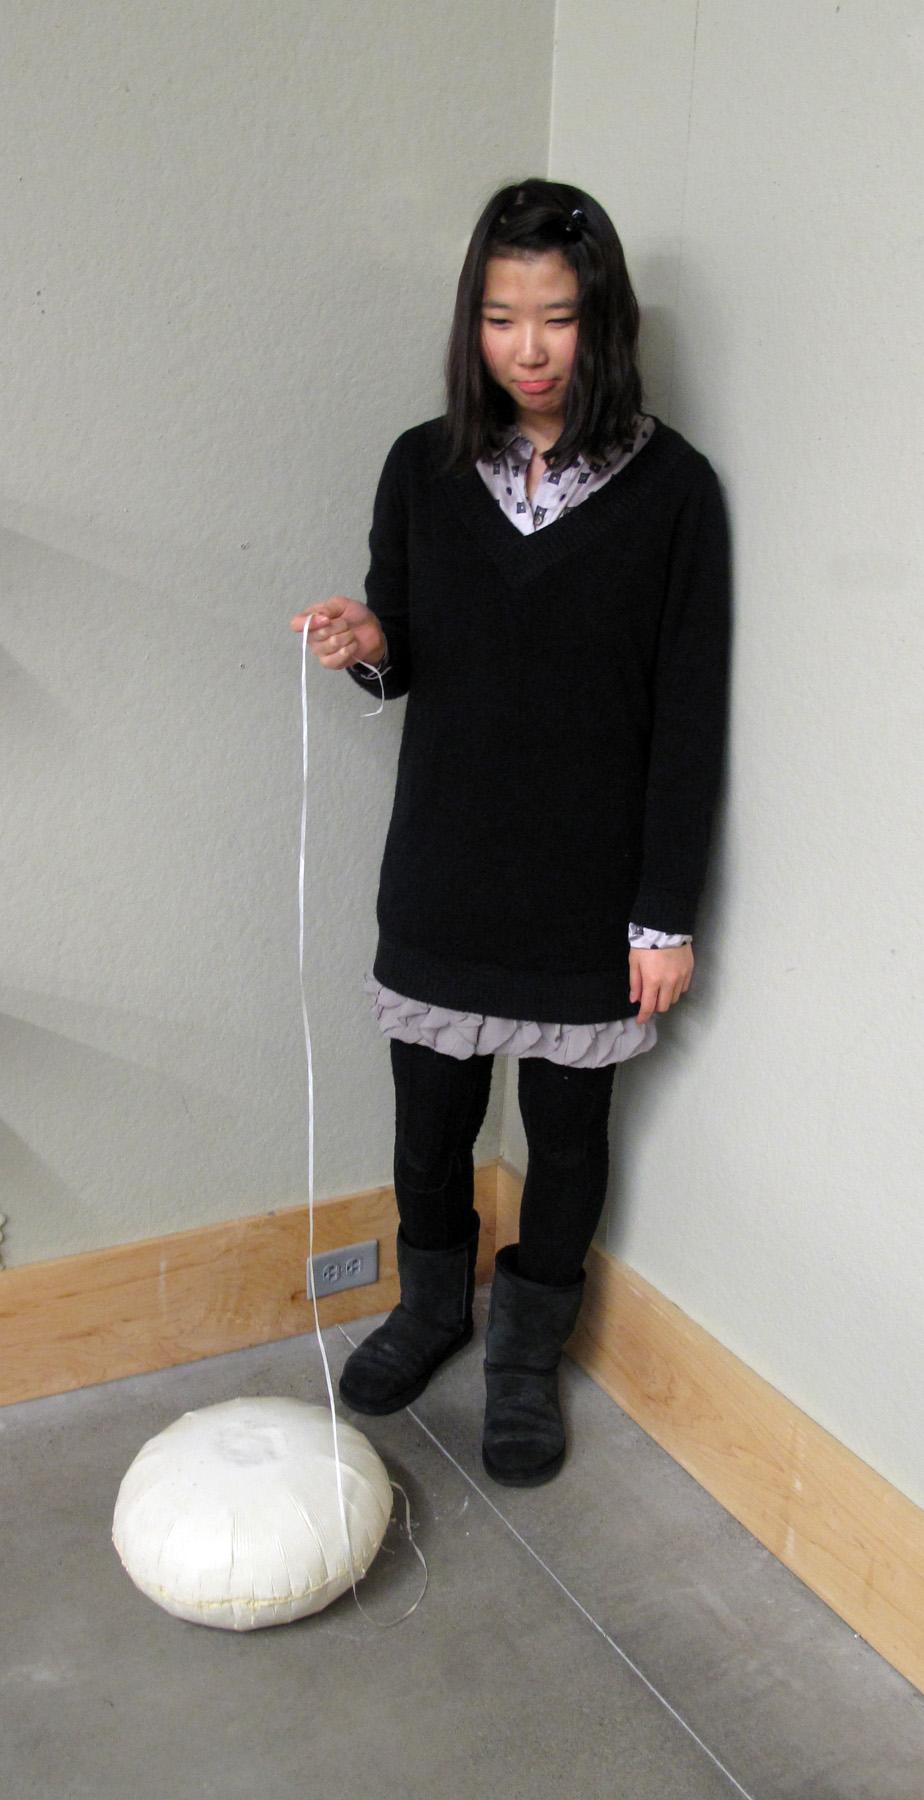 Minsu K - Sad Balloon.jpg